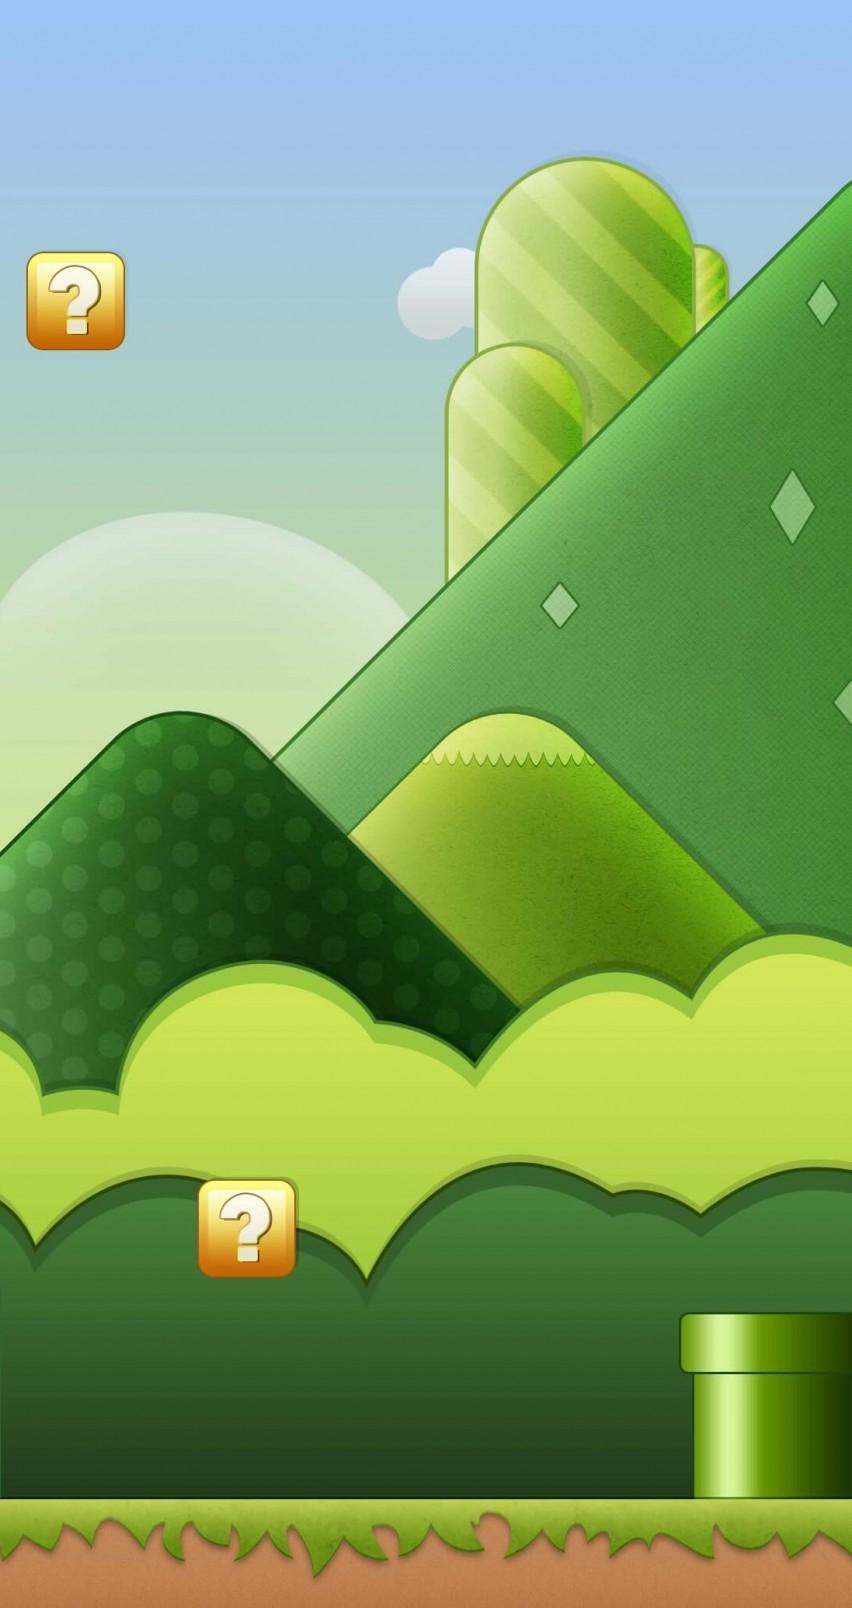 Wallpaper iphone mario bross - Super Mario Bros World Hd Wallpaper For Iphone 6 Hdwallpapers Net